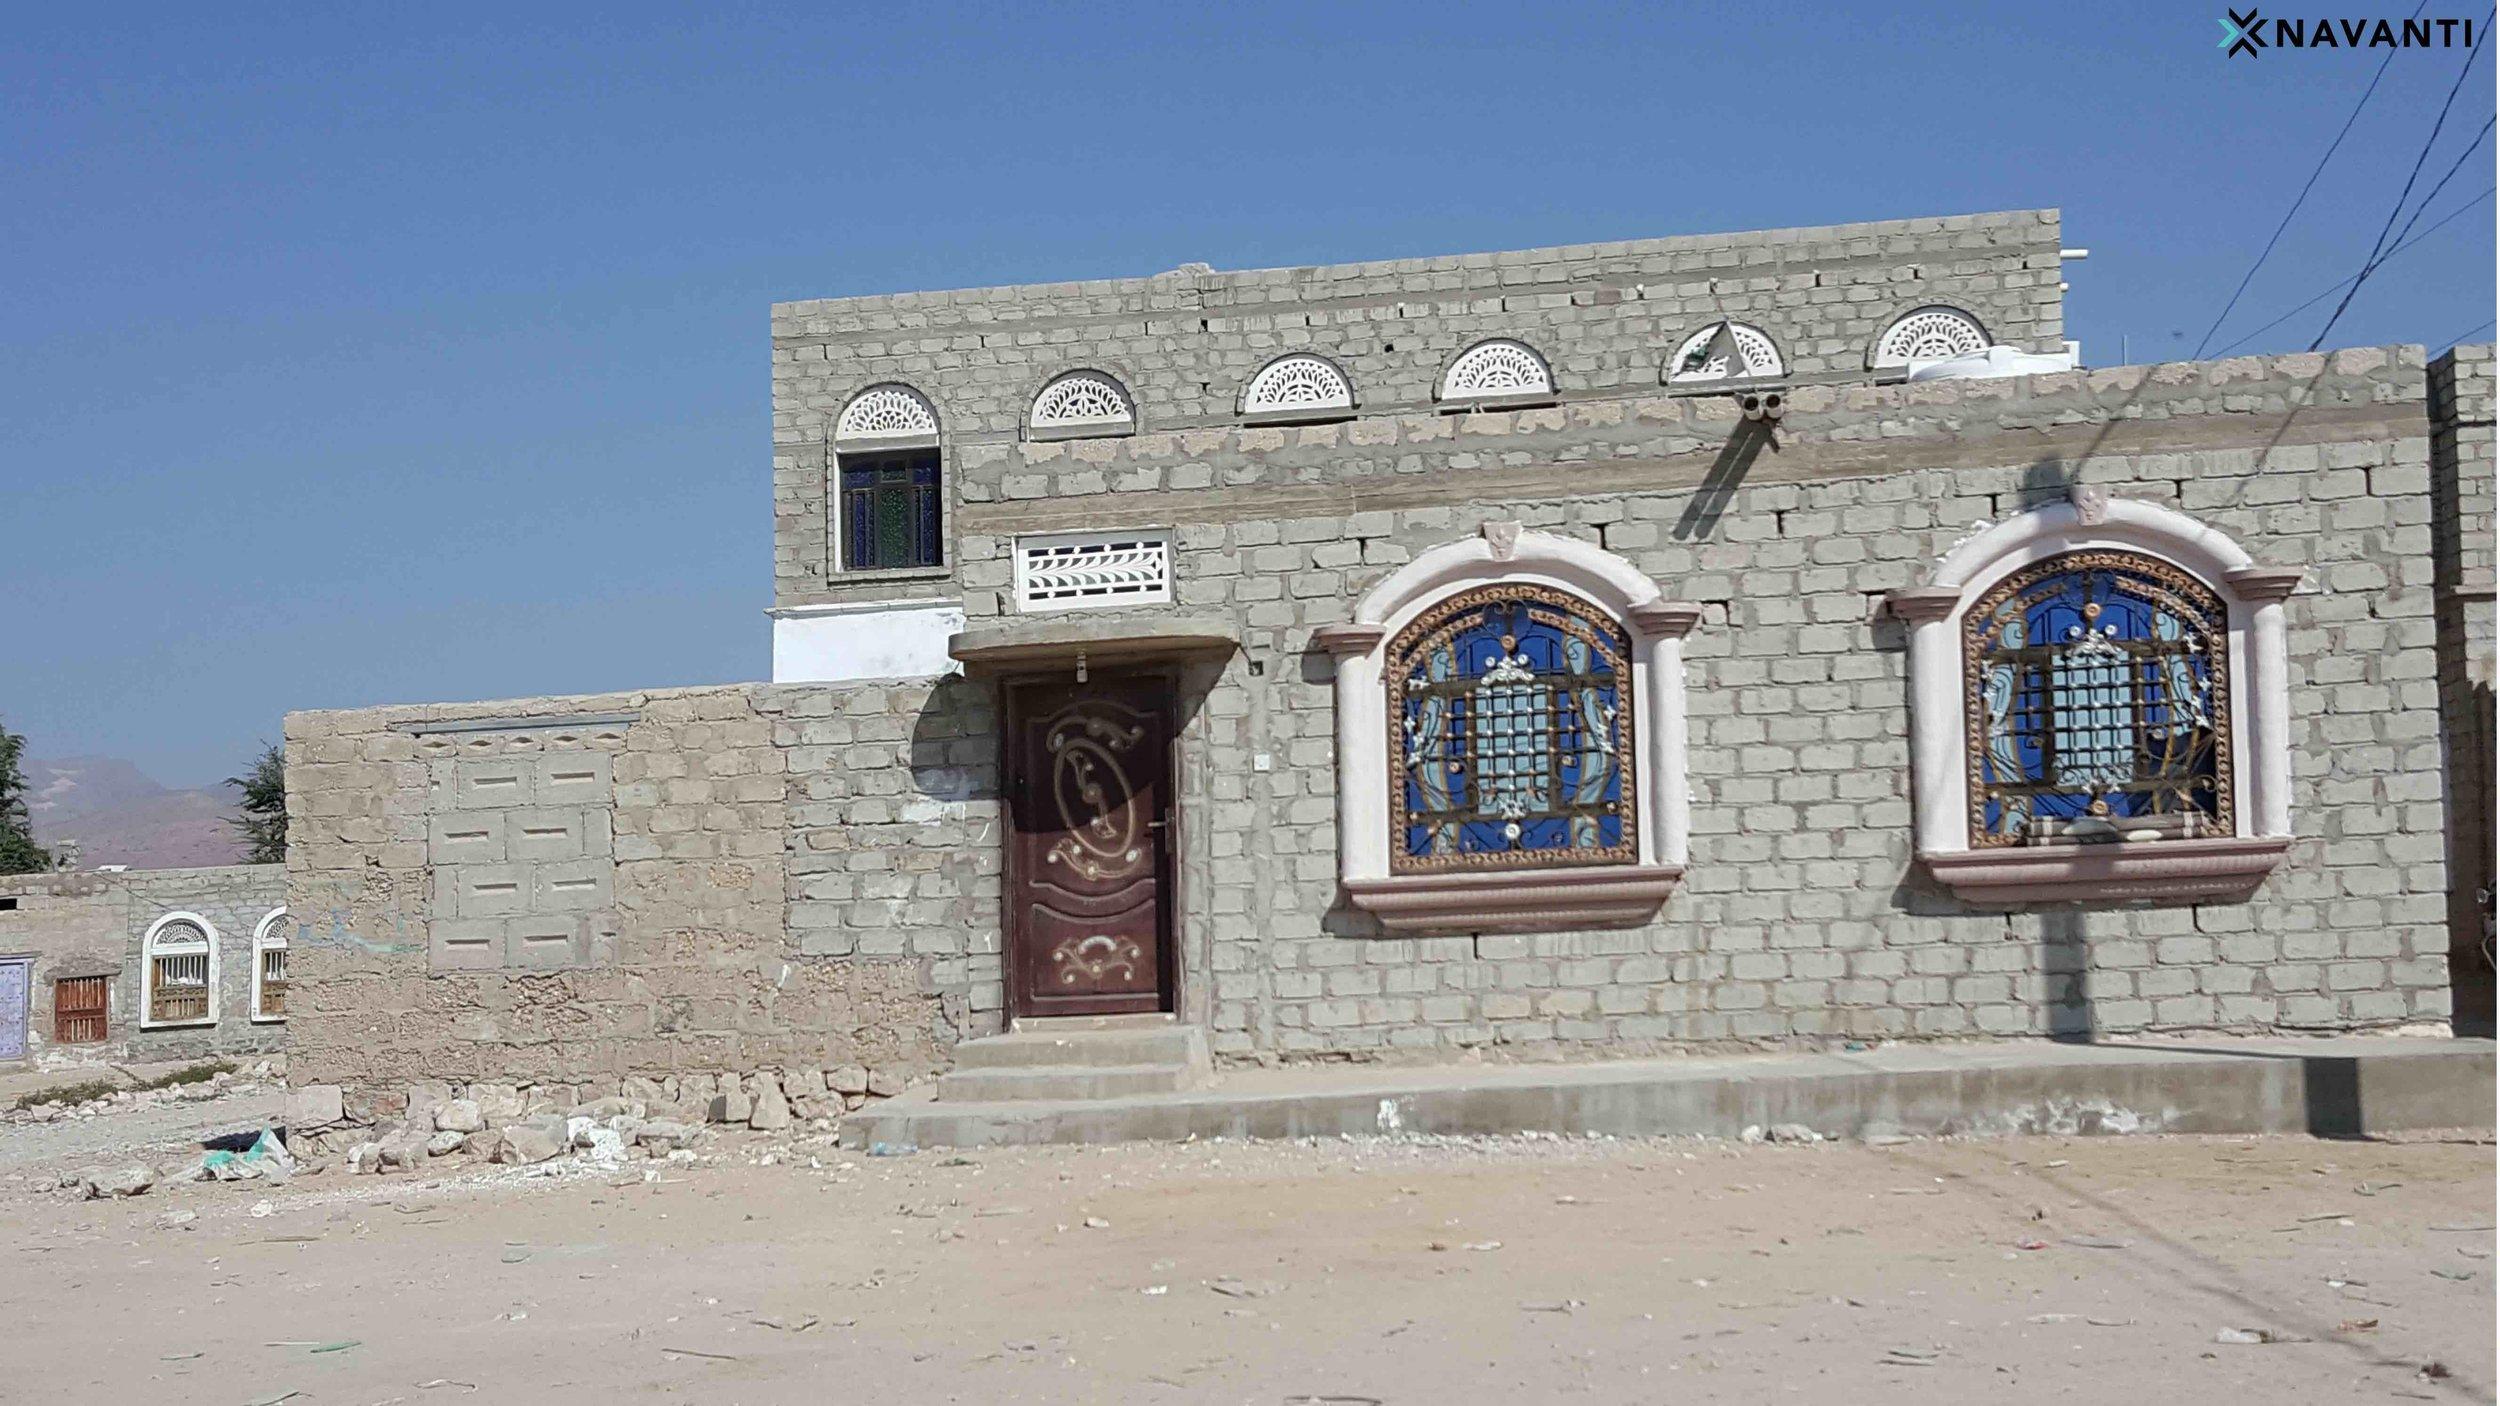 House in Sayhut, al-Mahra. Source: Navanti